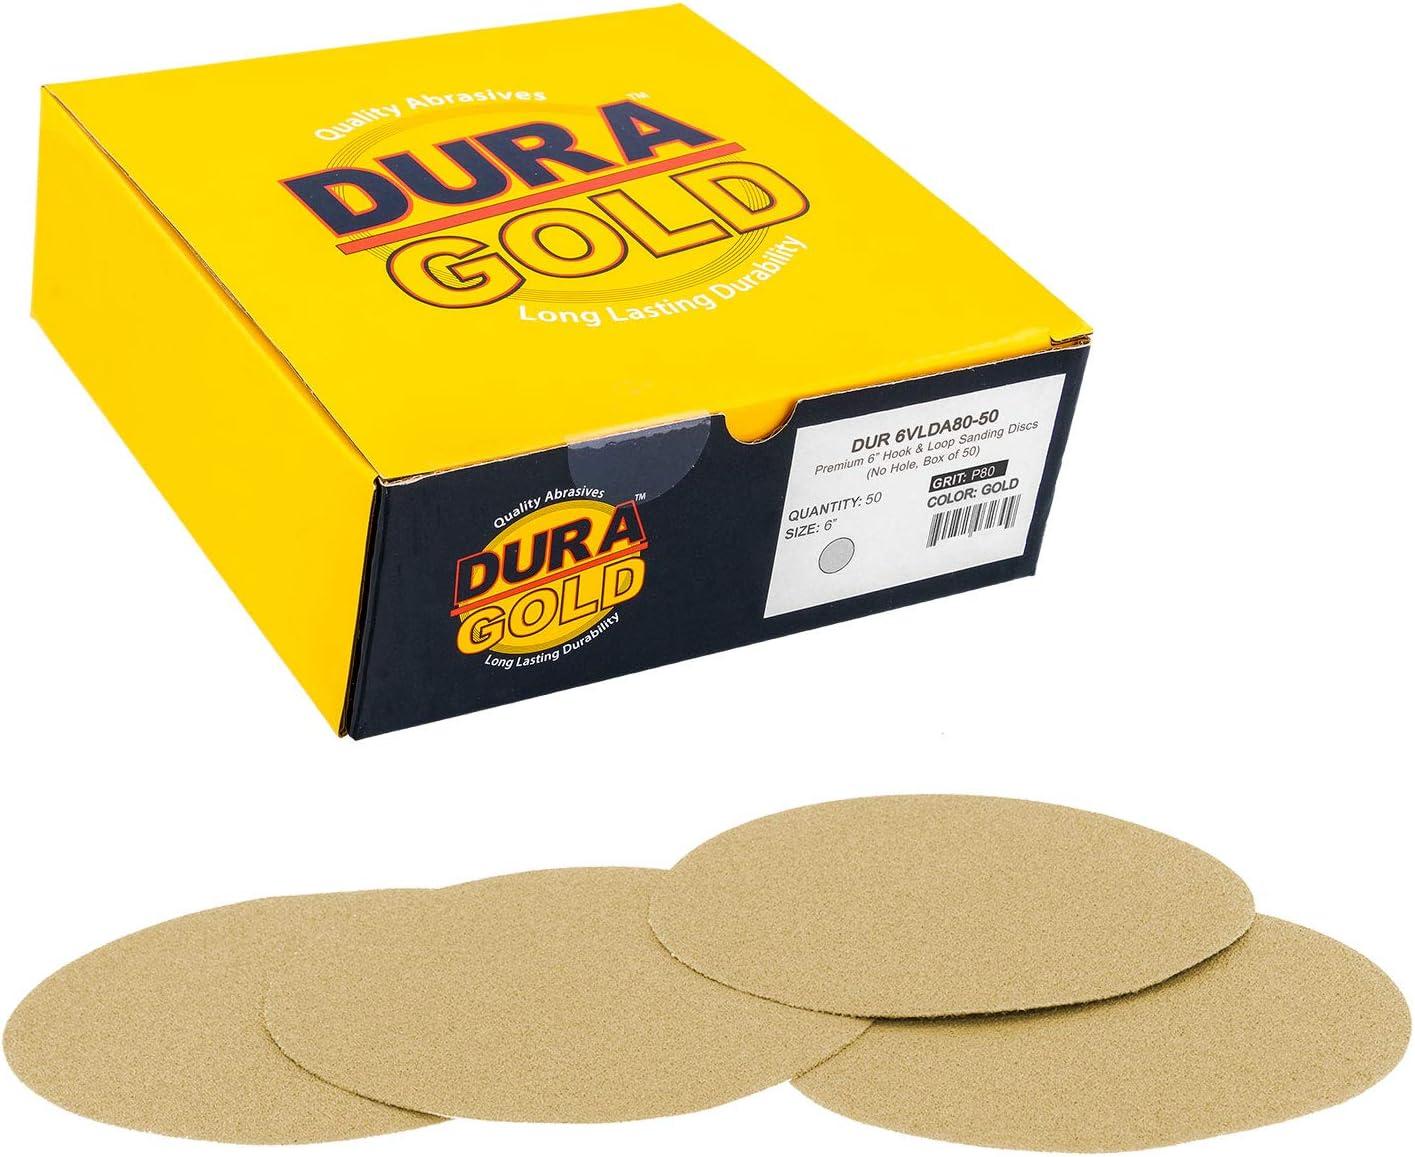 "Dura-Gold - Premium - 80 Grit 6"" Gold Hook & Loop No Hole Sanding Discs for DA Sanders - Box of 50 Sandpaper Finishing Discs for Automotive and Woodworking 71BzLuKebrL"